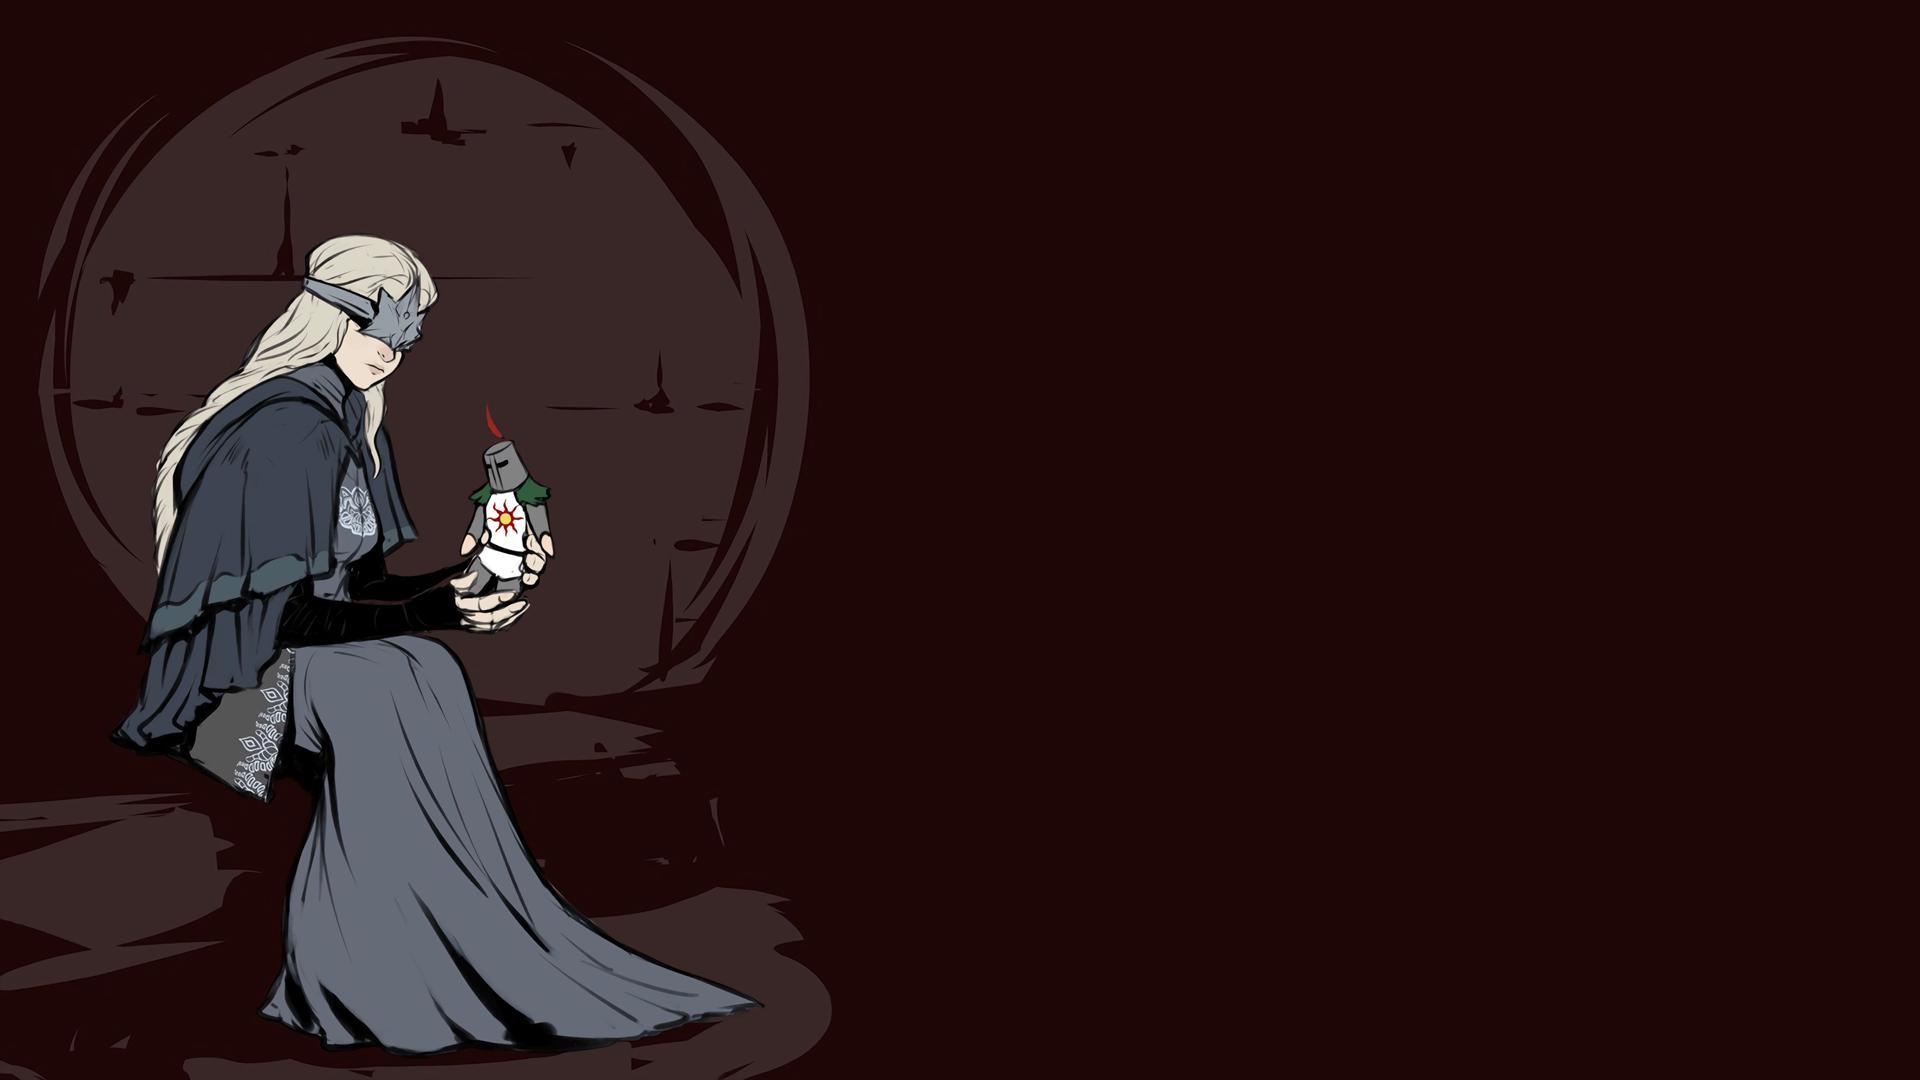 Pin By Jay Inki On Wallpapers Dark Souls Dark Souls Game Art Game Art